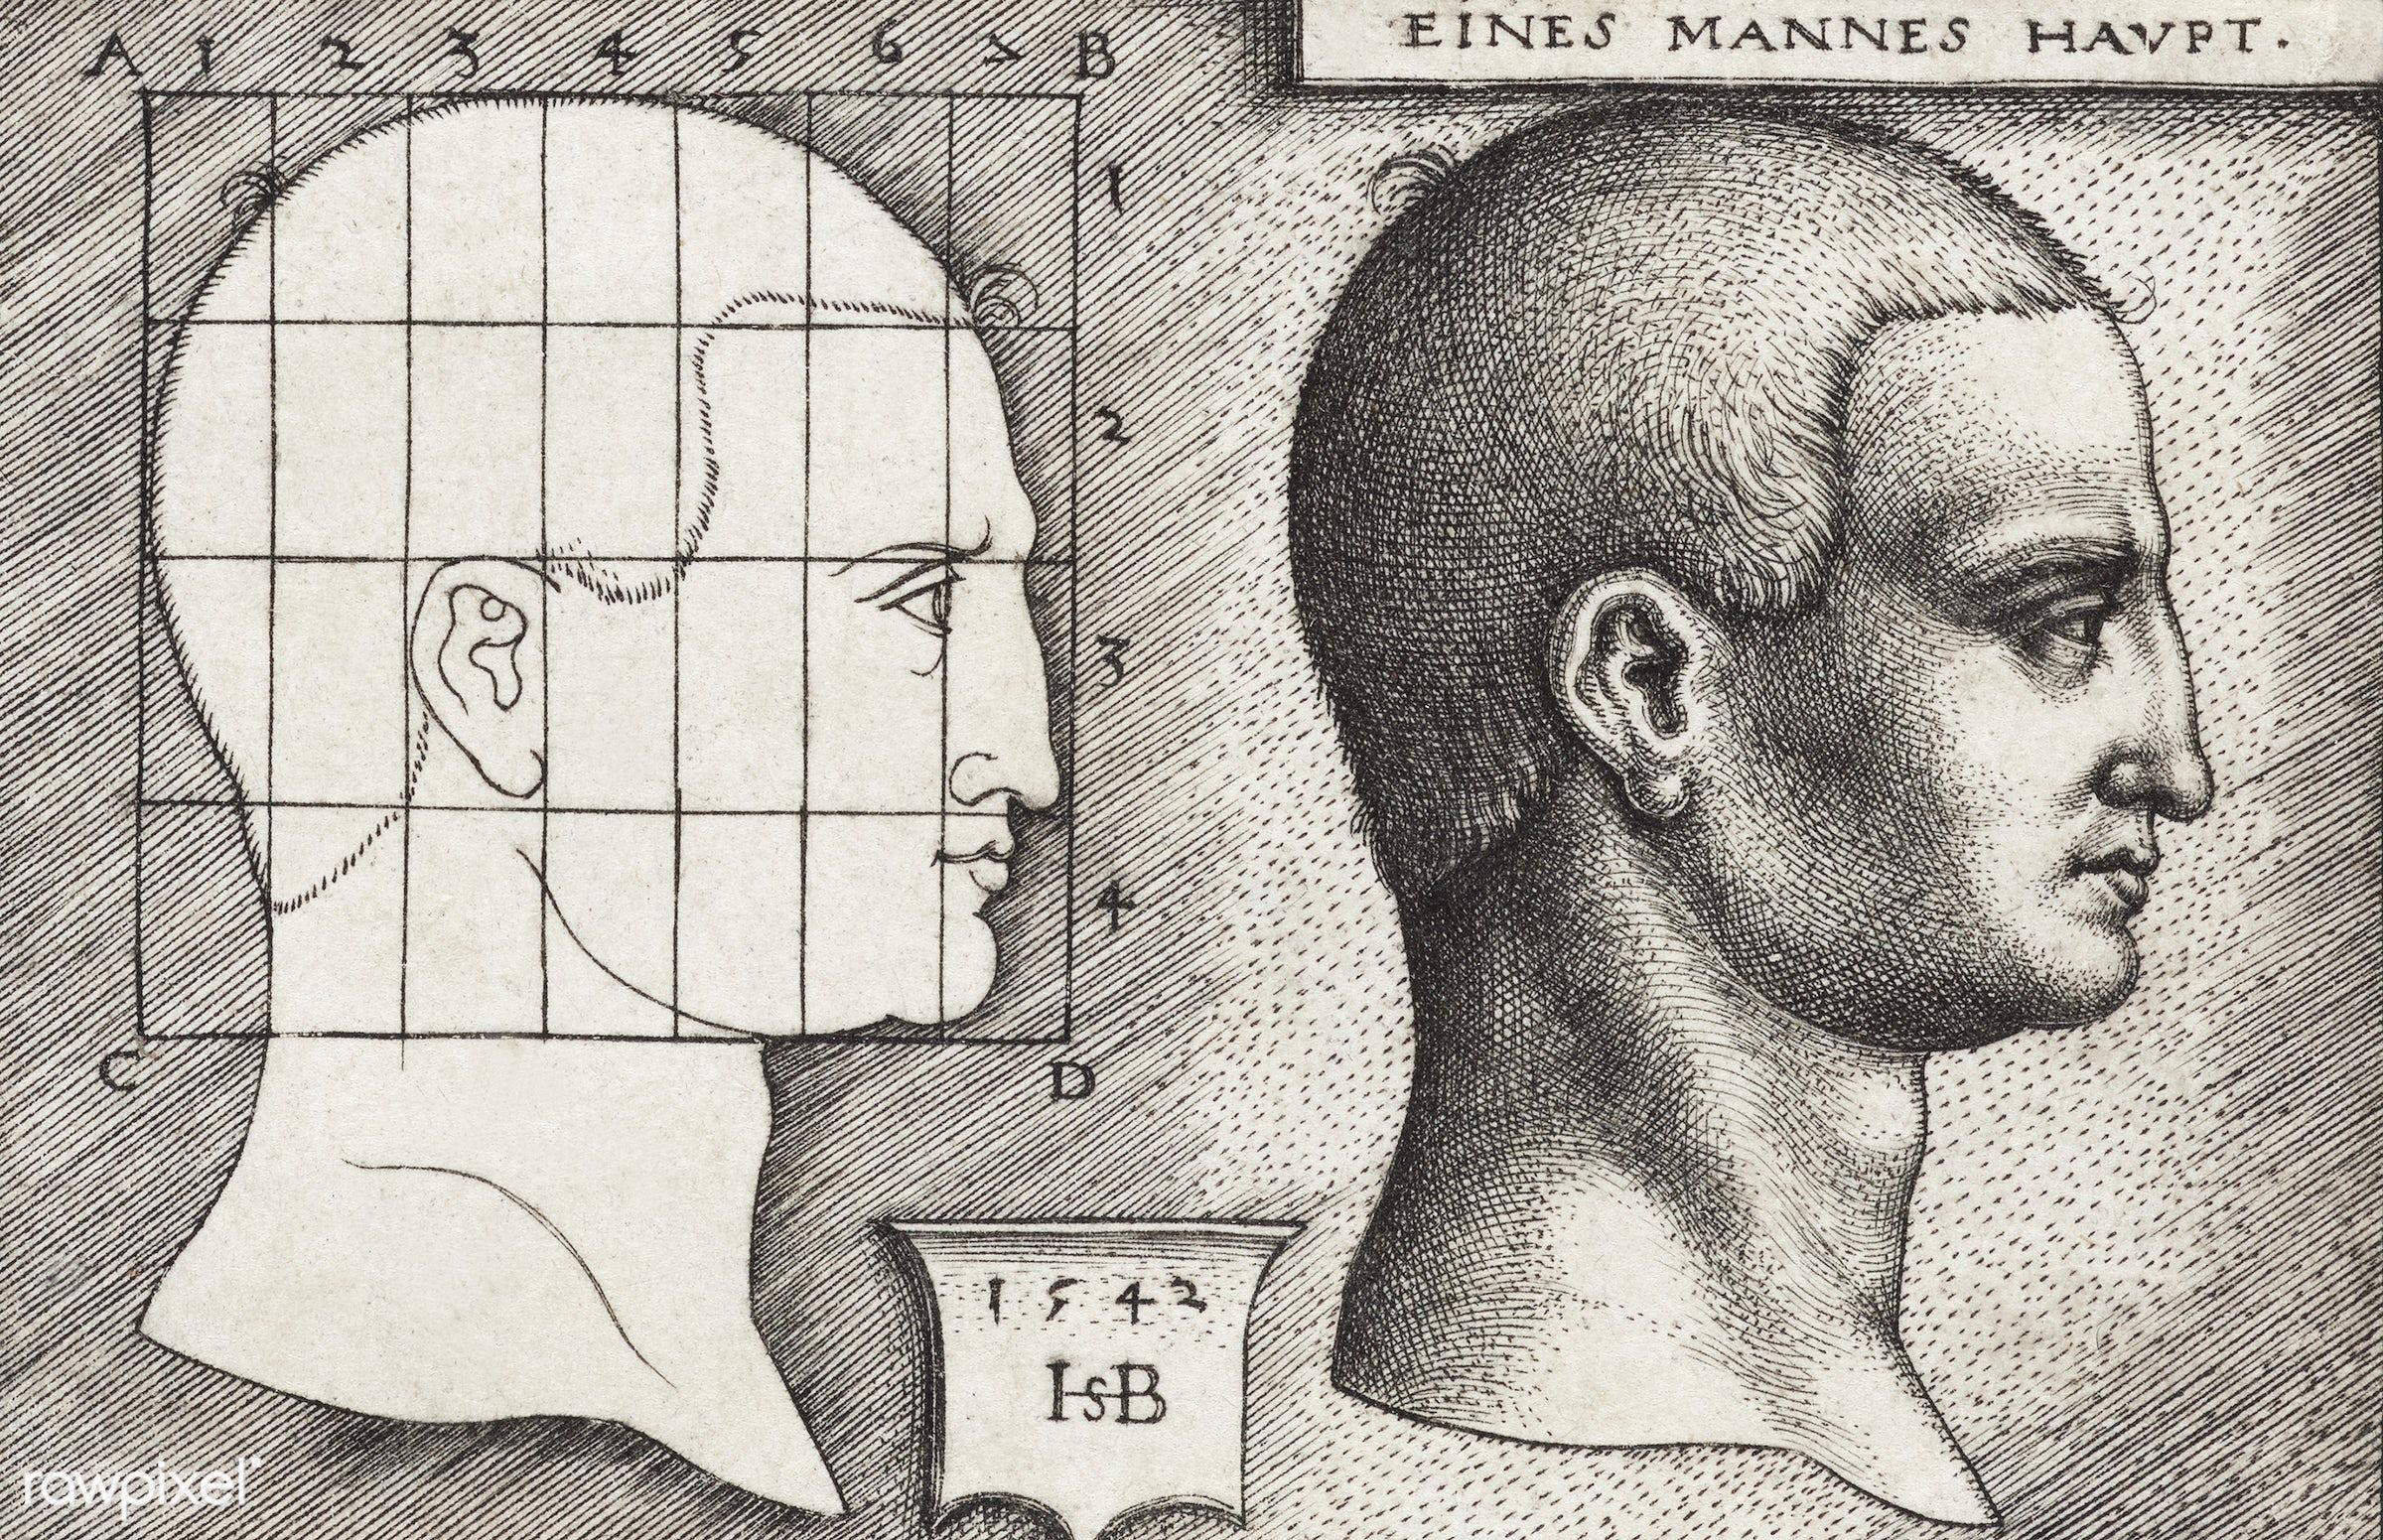 Vintage Illustration Profile Study of Man's Head published in 1542 by Hans Sebald Beham (1500-1550) - anatomy, antique,...